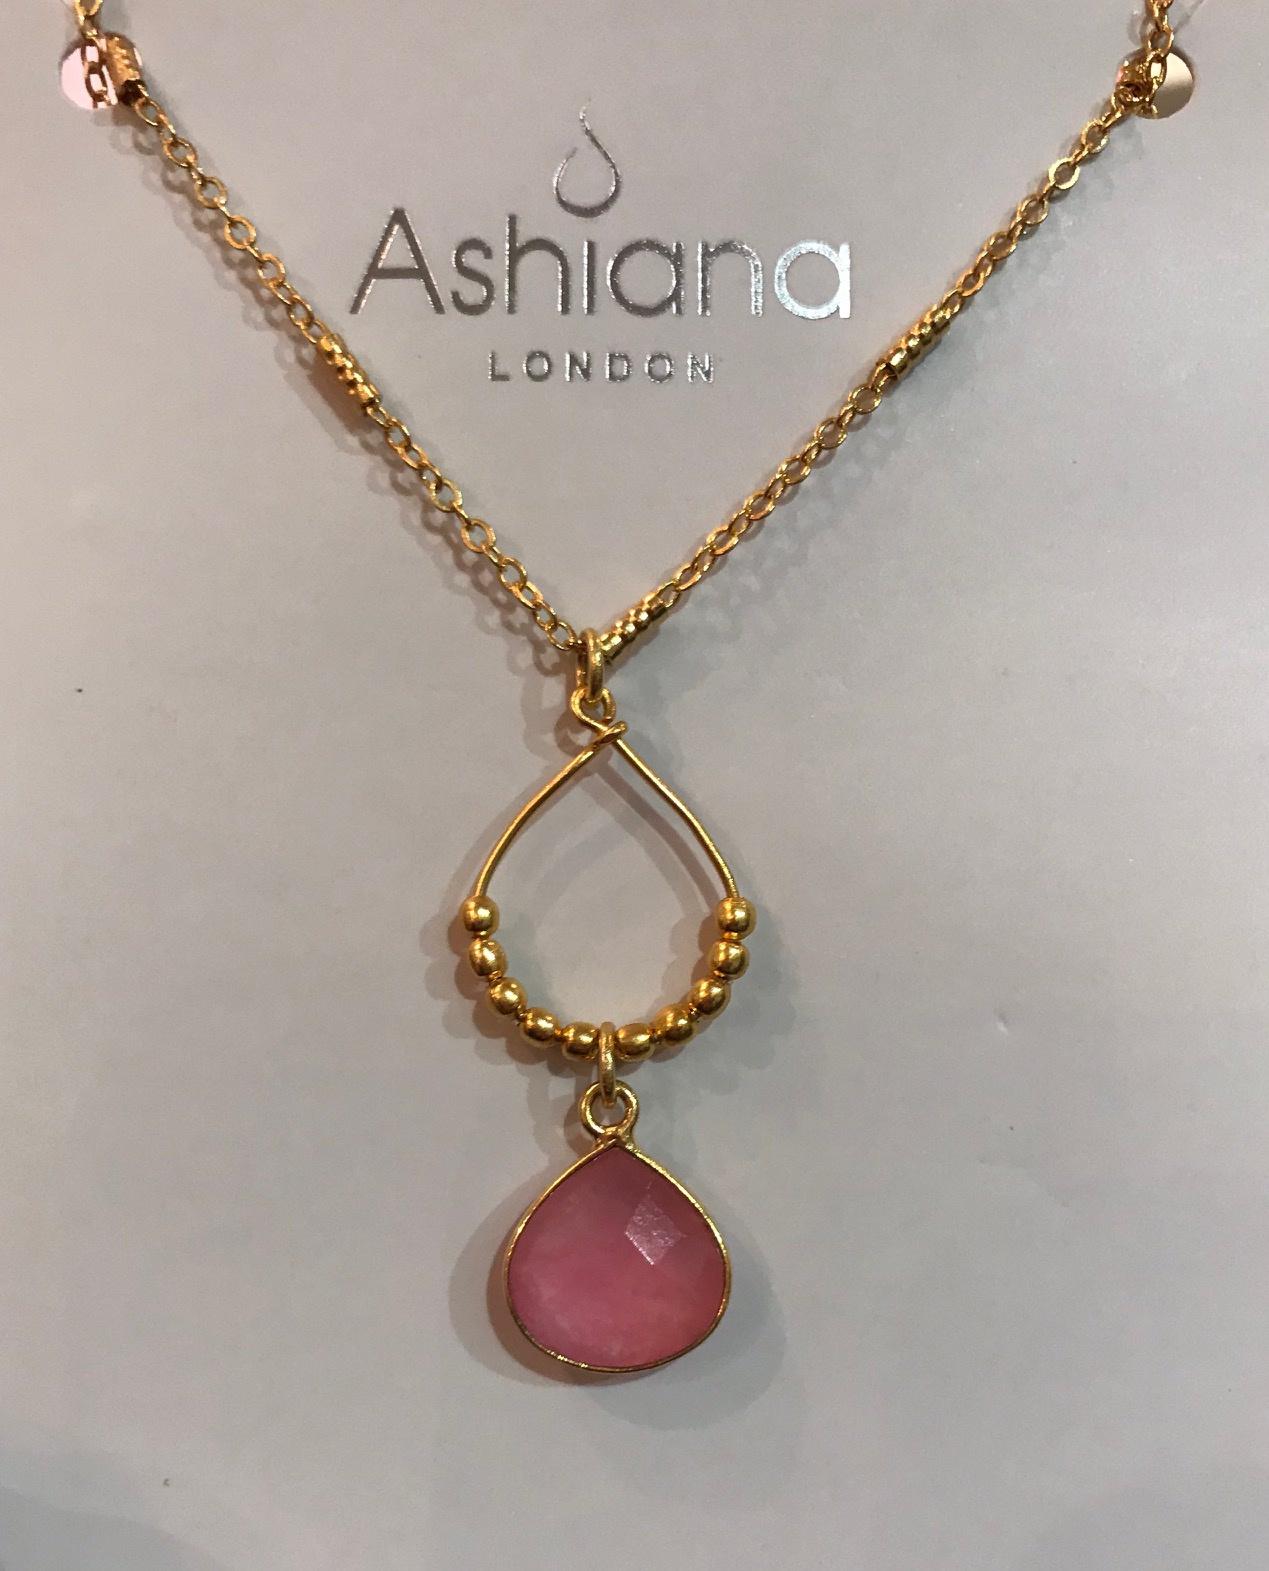 Mini Teardrop 22 carat gold necklace by Ashiana